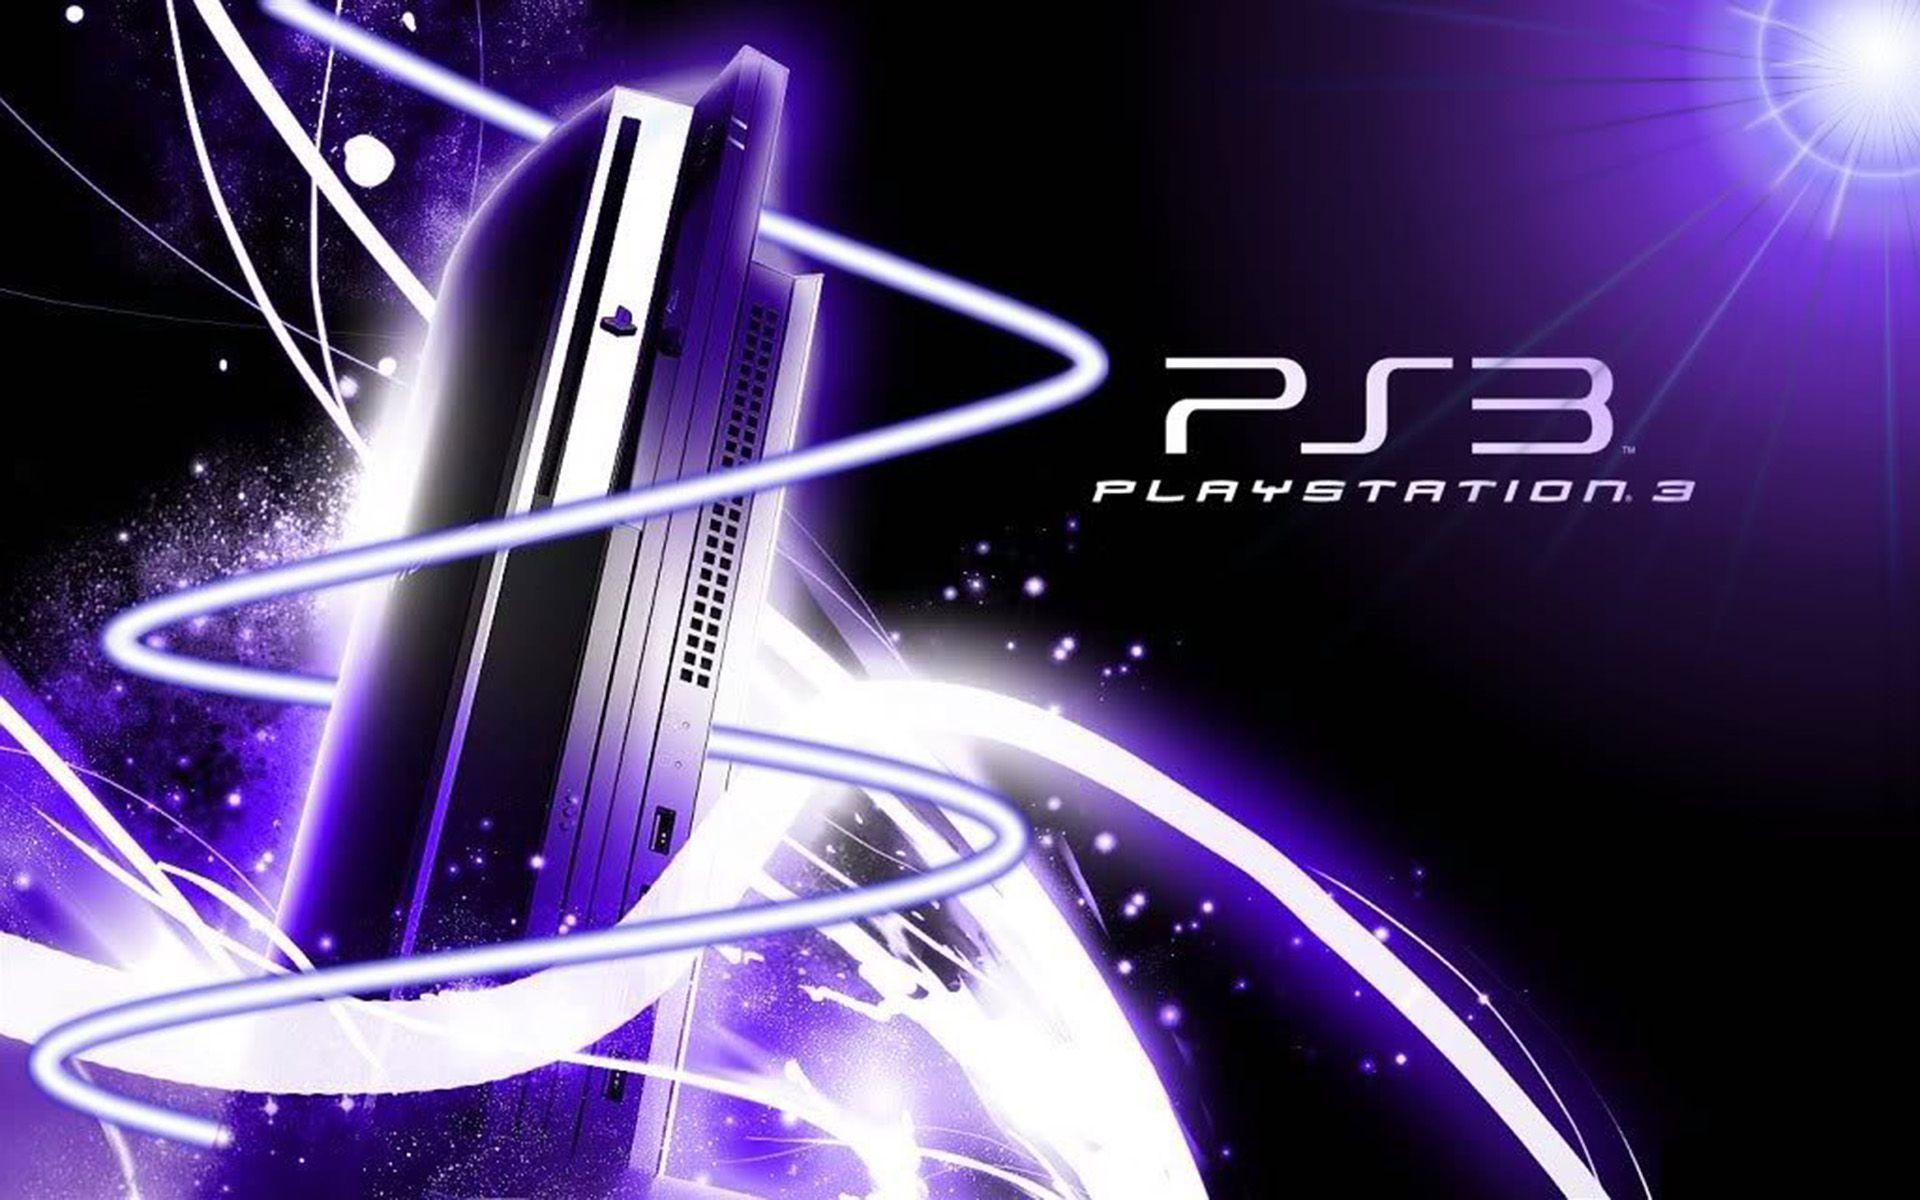 Free Playstation 3 Live Wallpaper